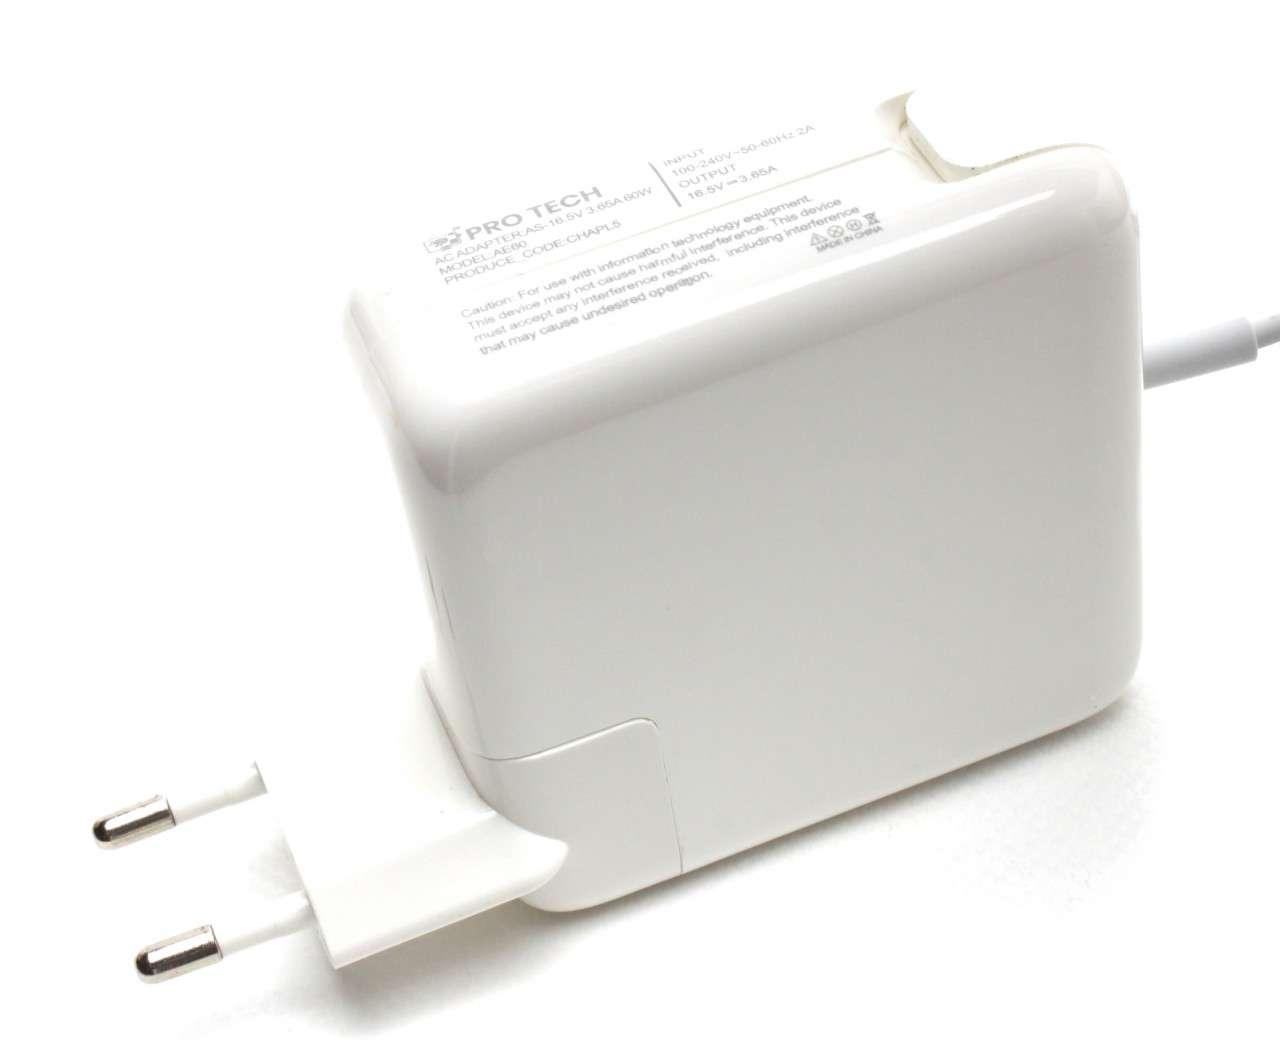 Incarcator Apple MacBook Pro A1398 Replacement imagine powerlaptop.ro 2021